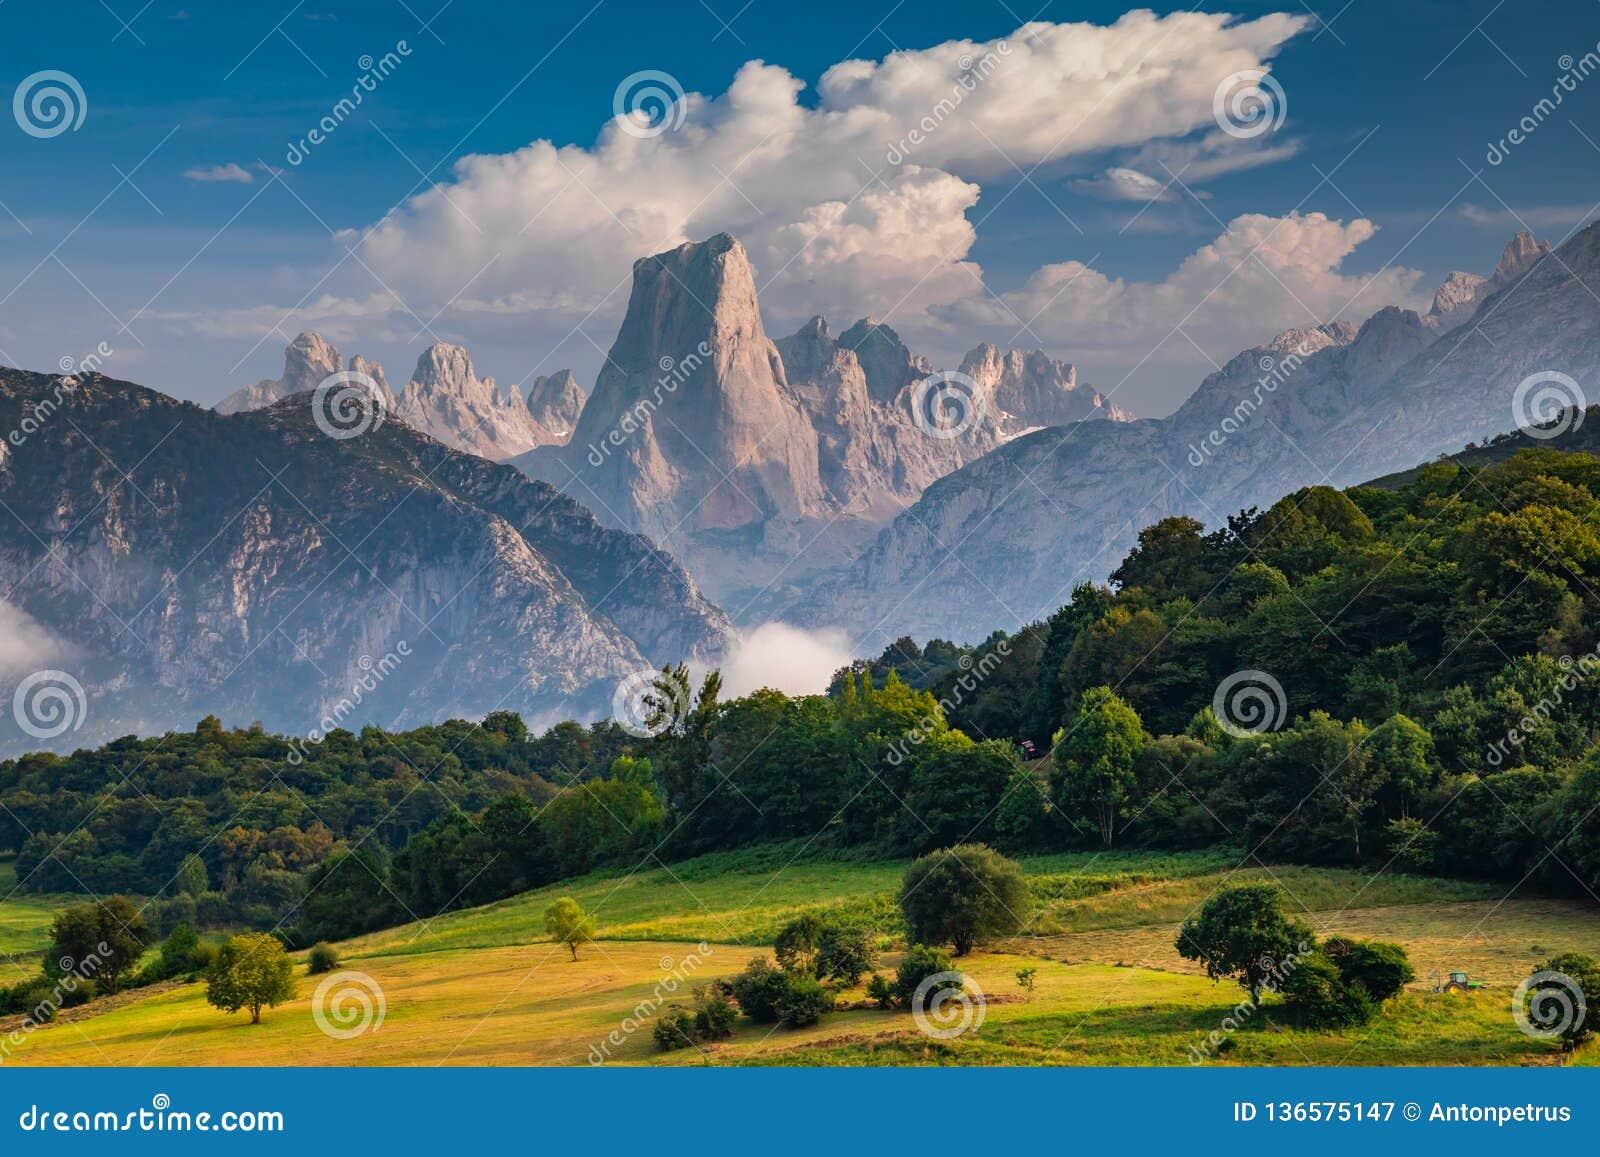 Naranjo DE Bulnes als Picu Urriellu in Asturias, Spanje wordt bekend dat